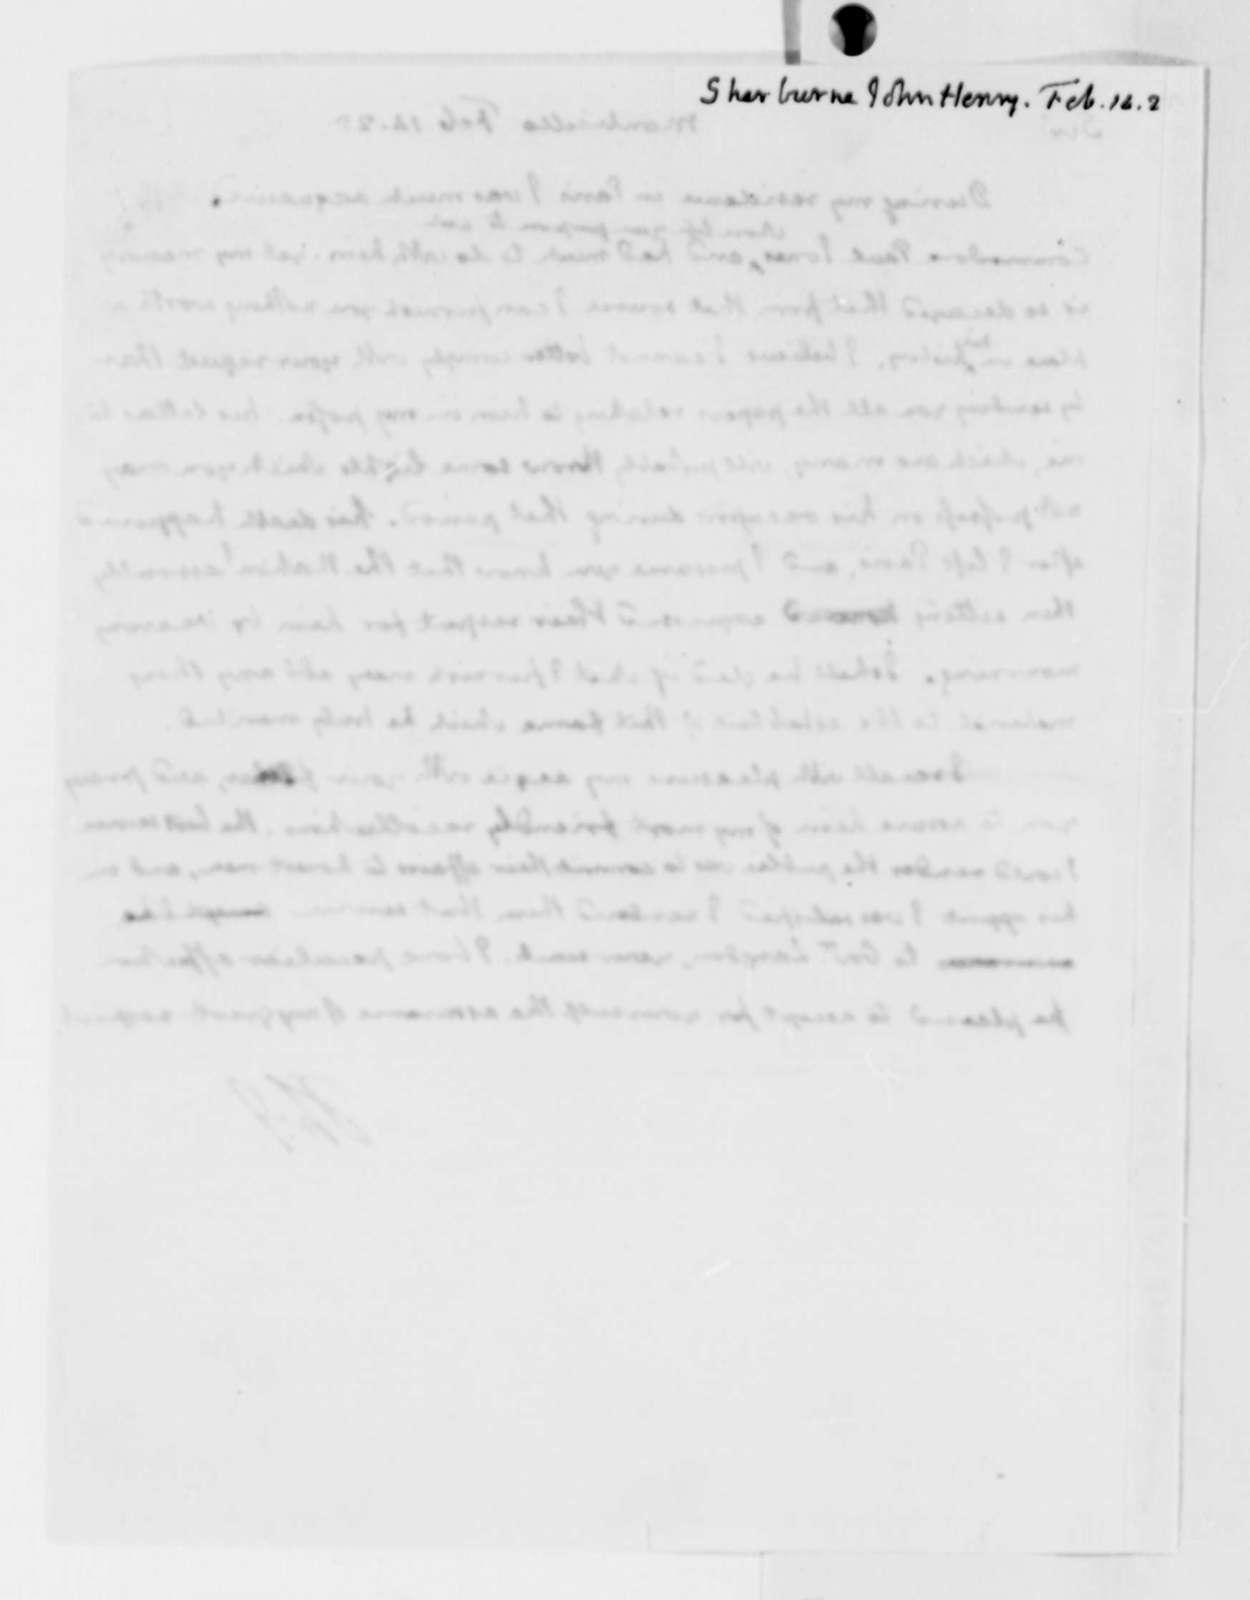 Thomas Jefferson to John Henry Sherburne, February 14, 1825